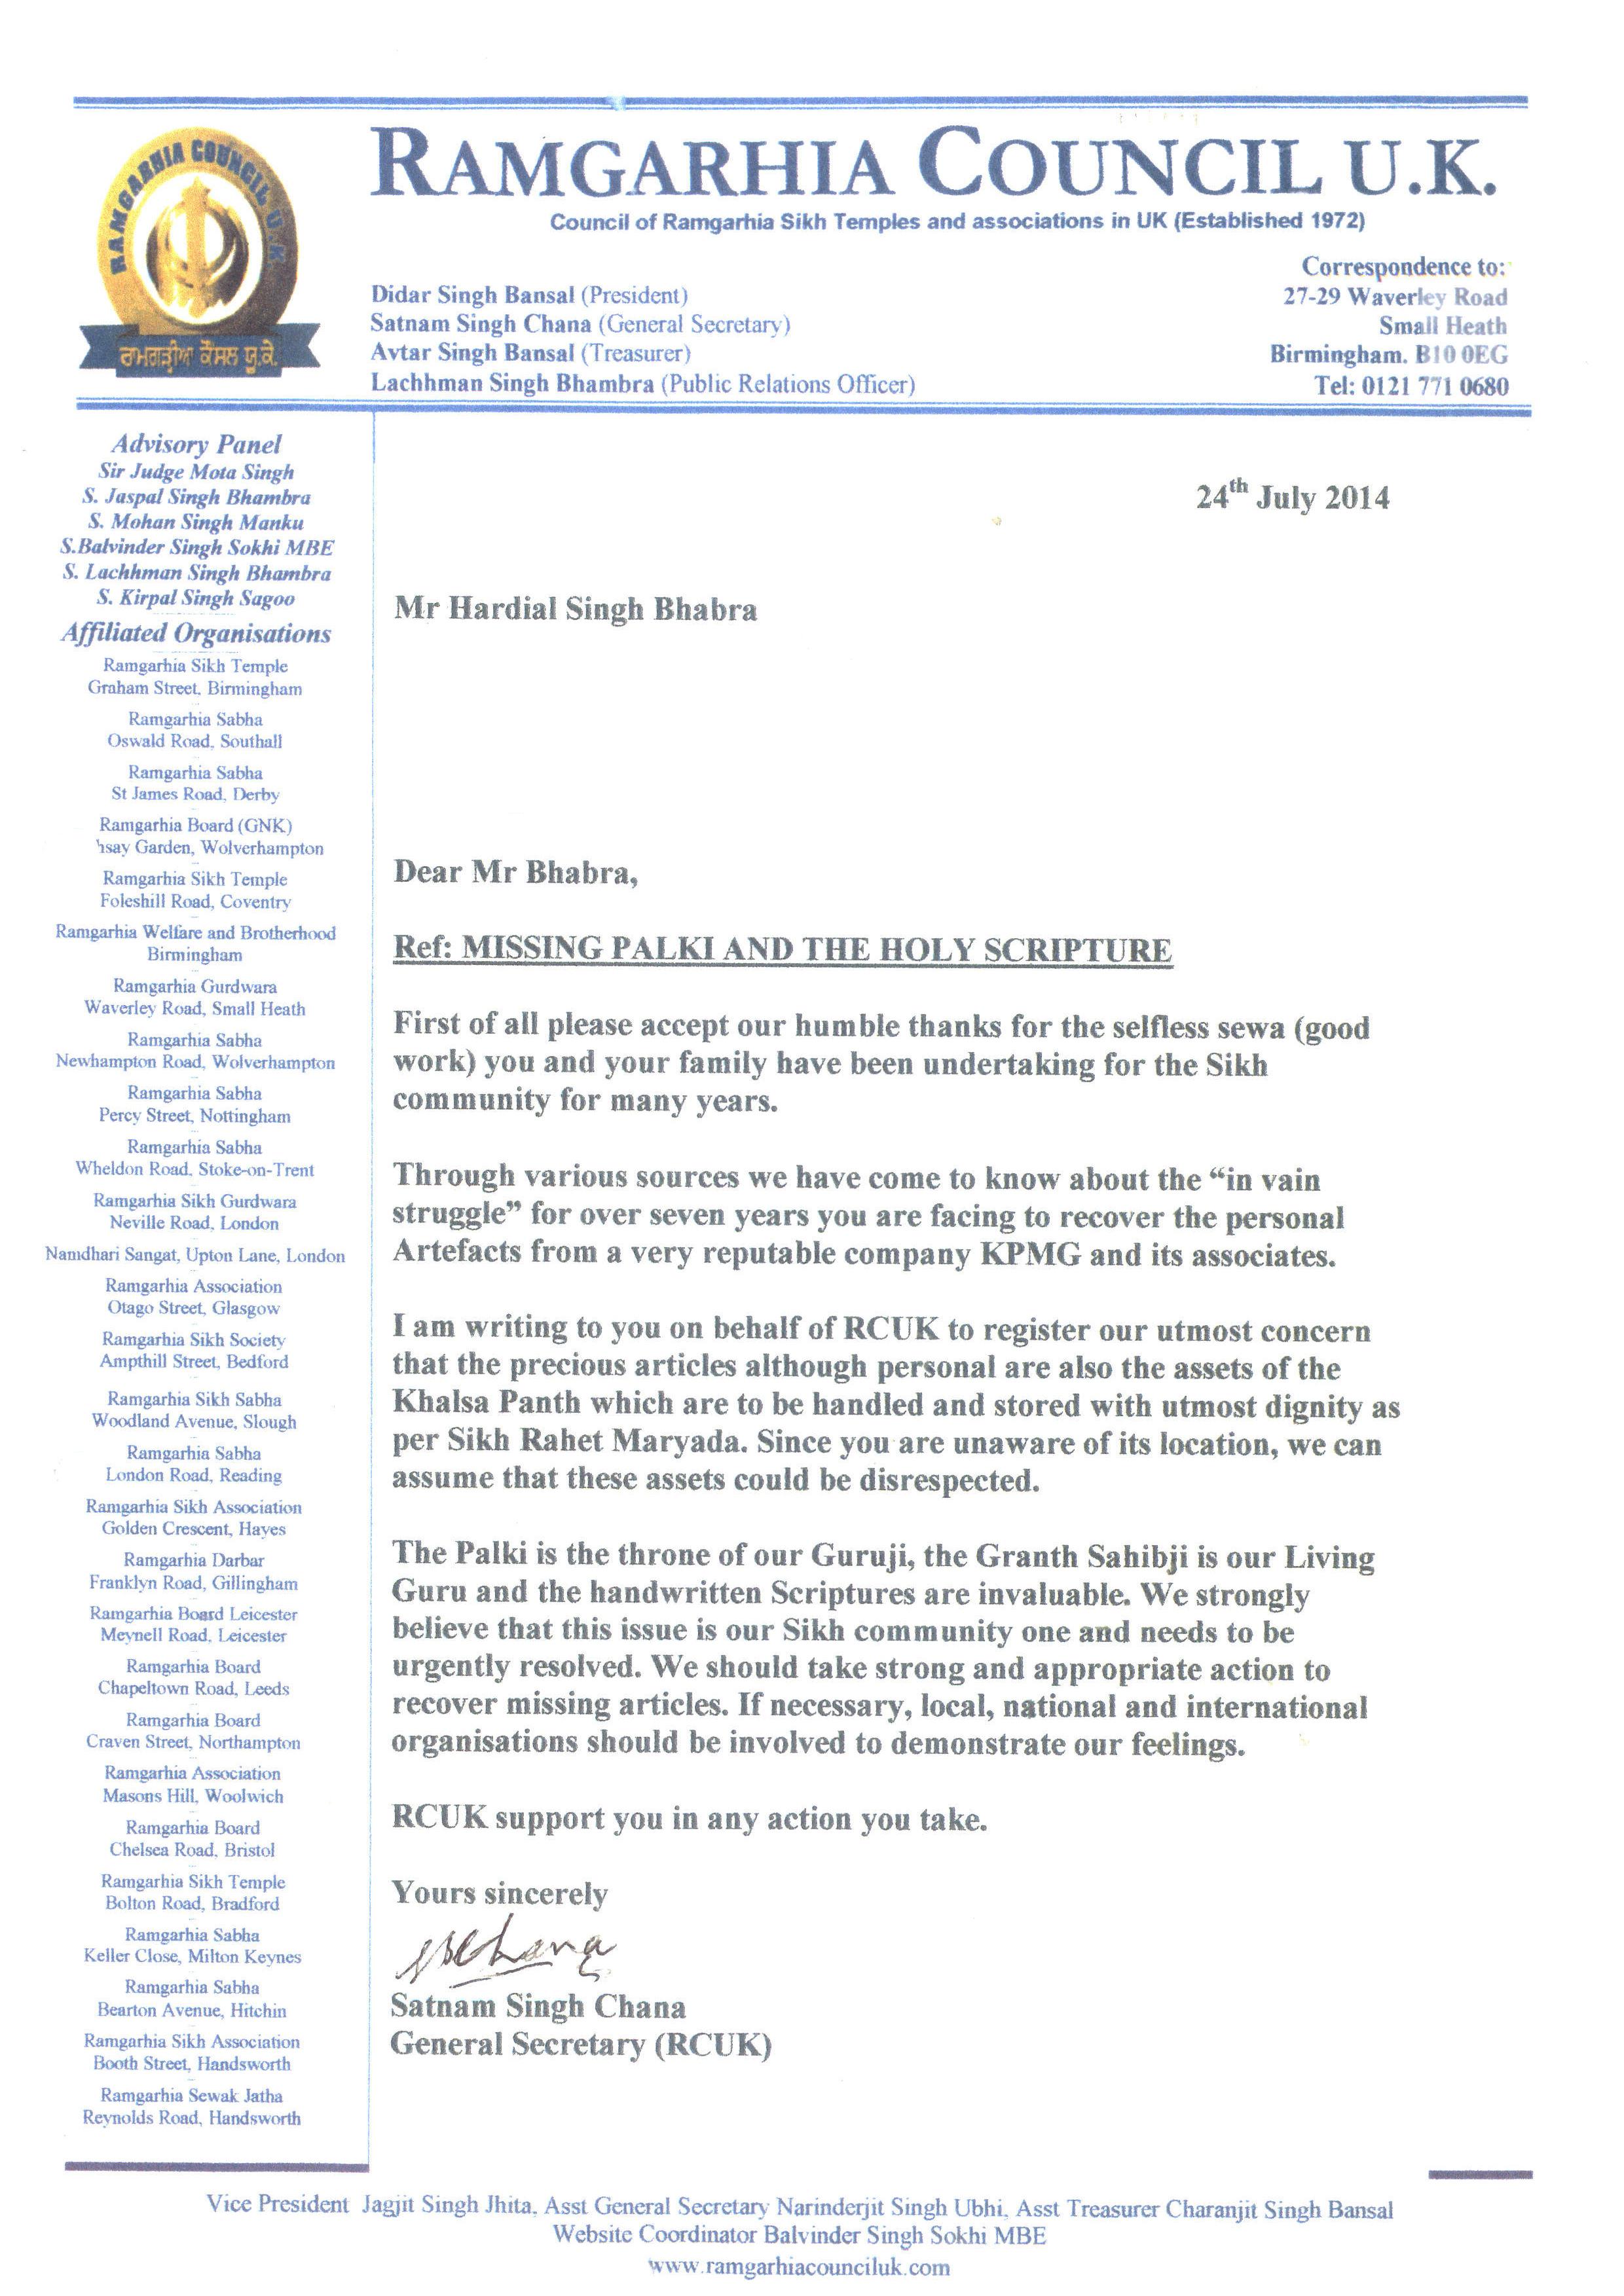 05_letter_Ramgarhia Council_A4.jpg